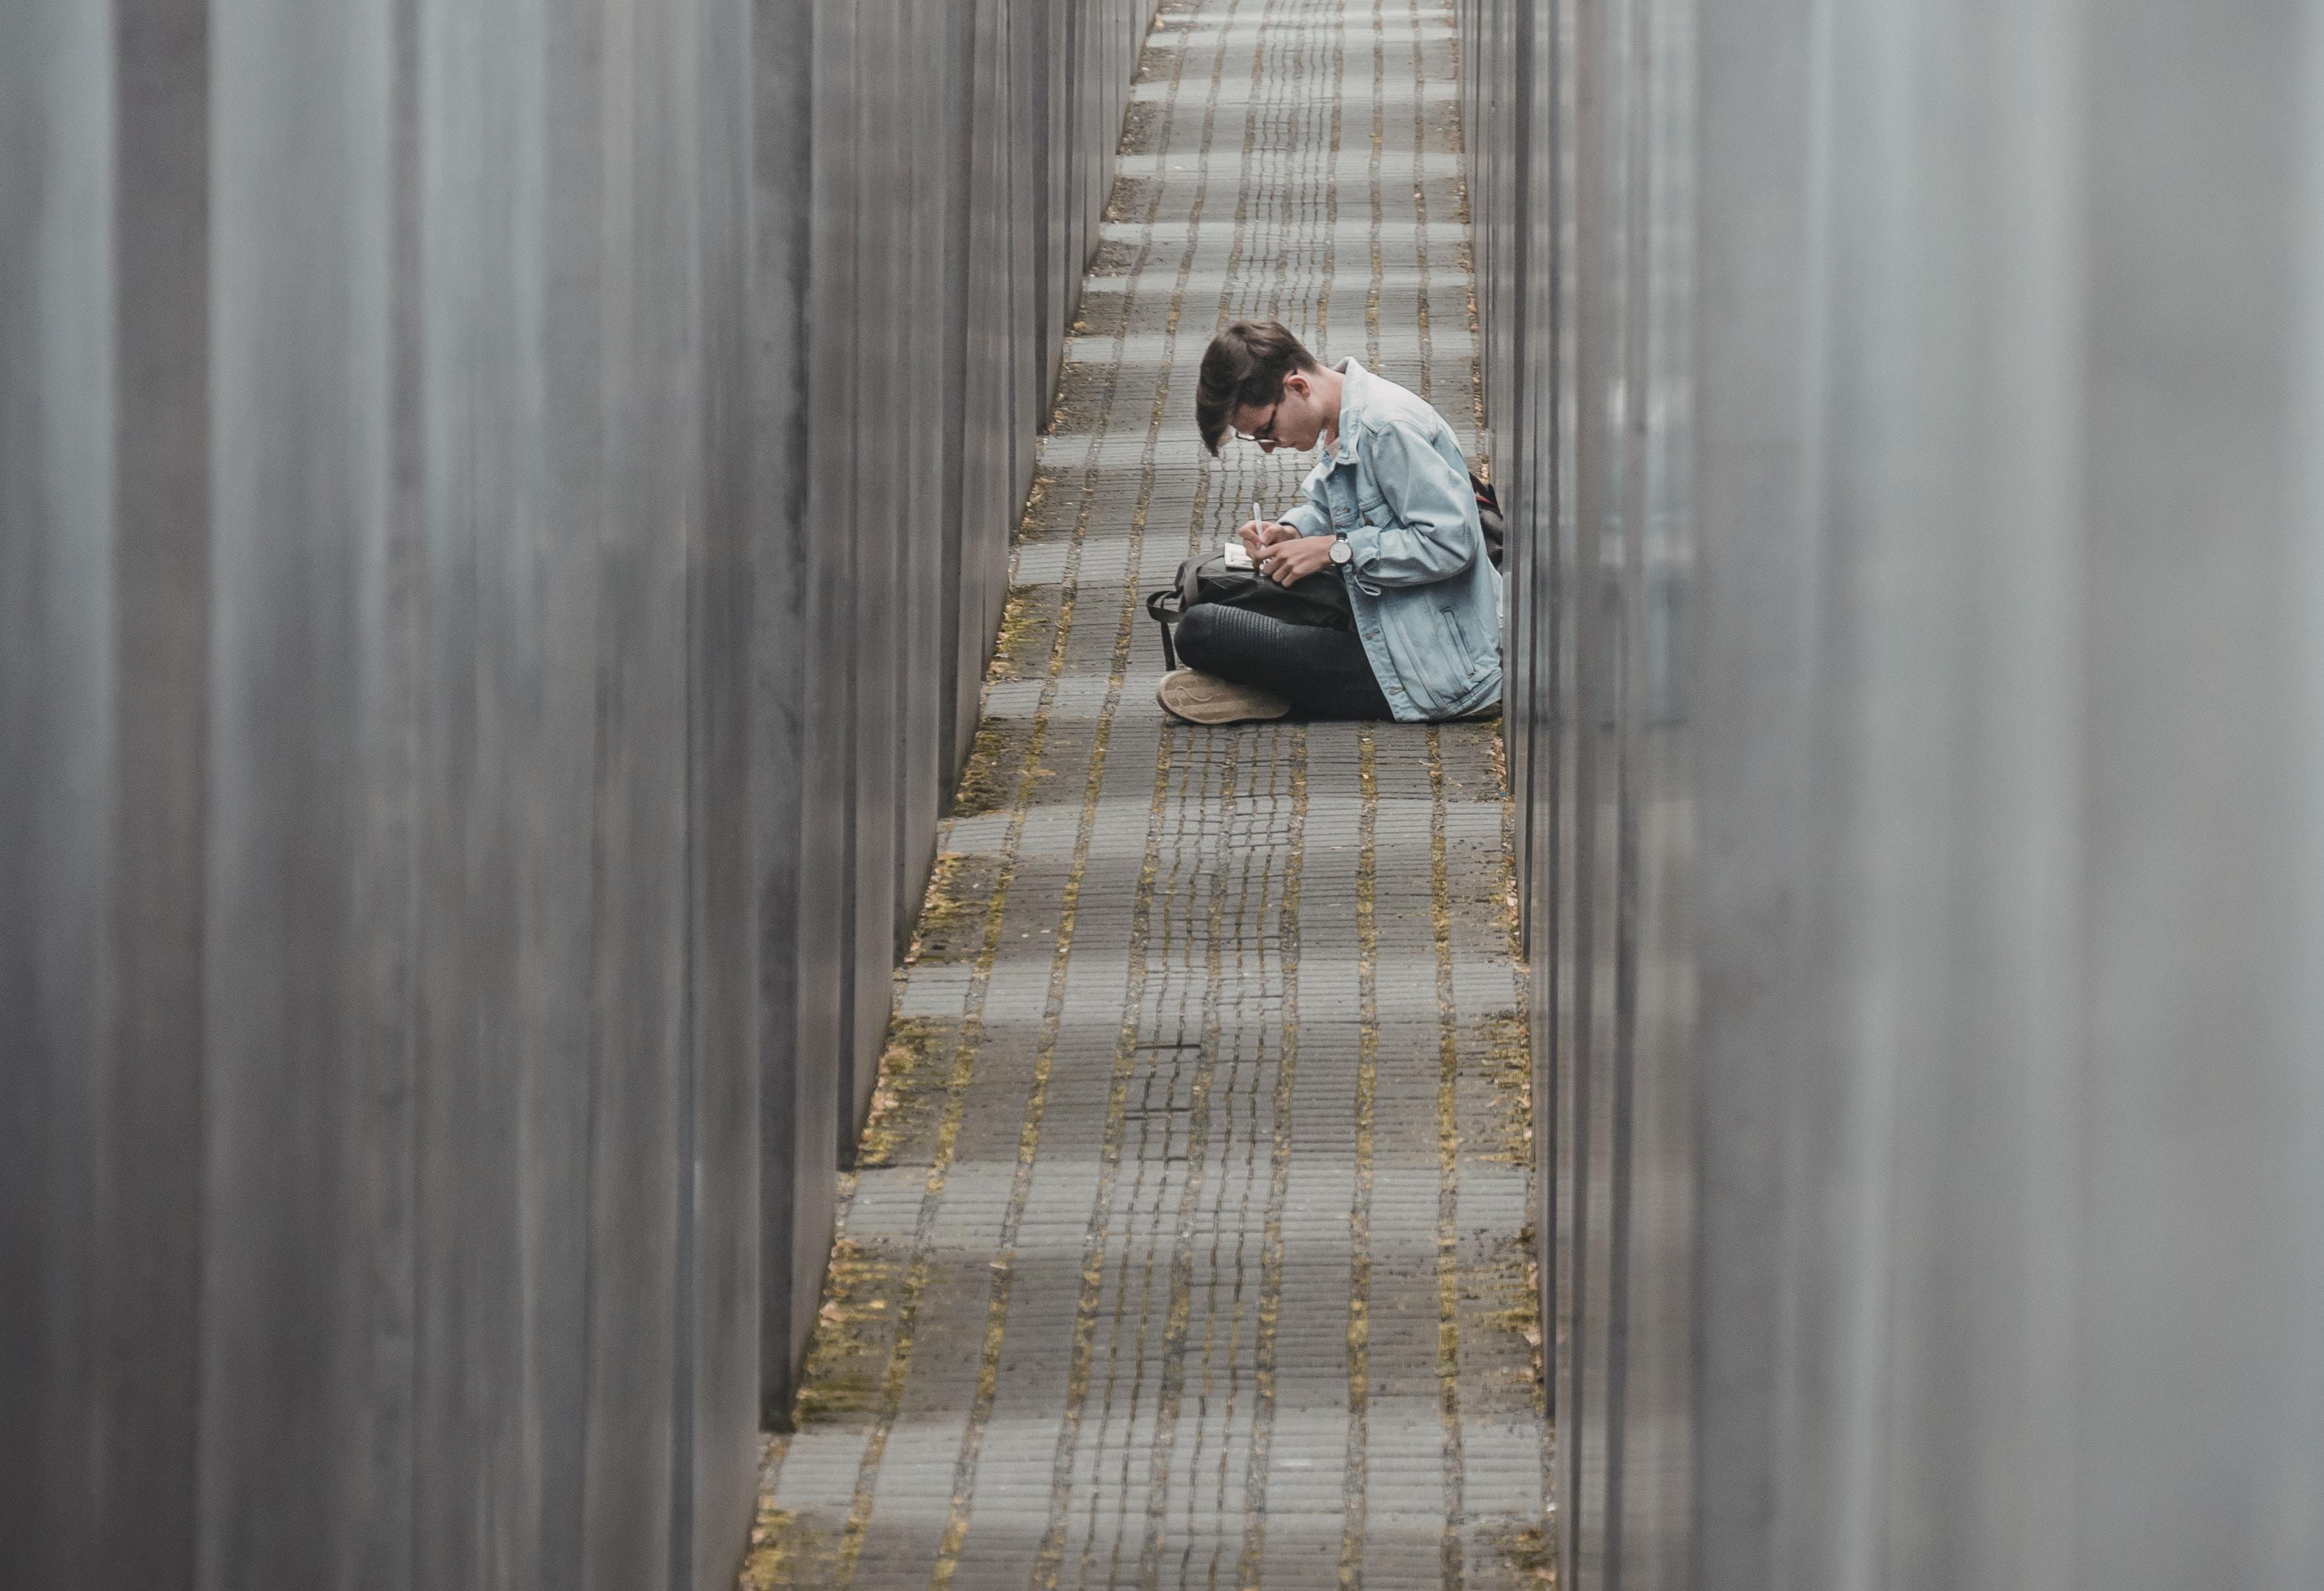 man sitting on pathway writing on paper